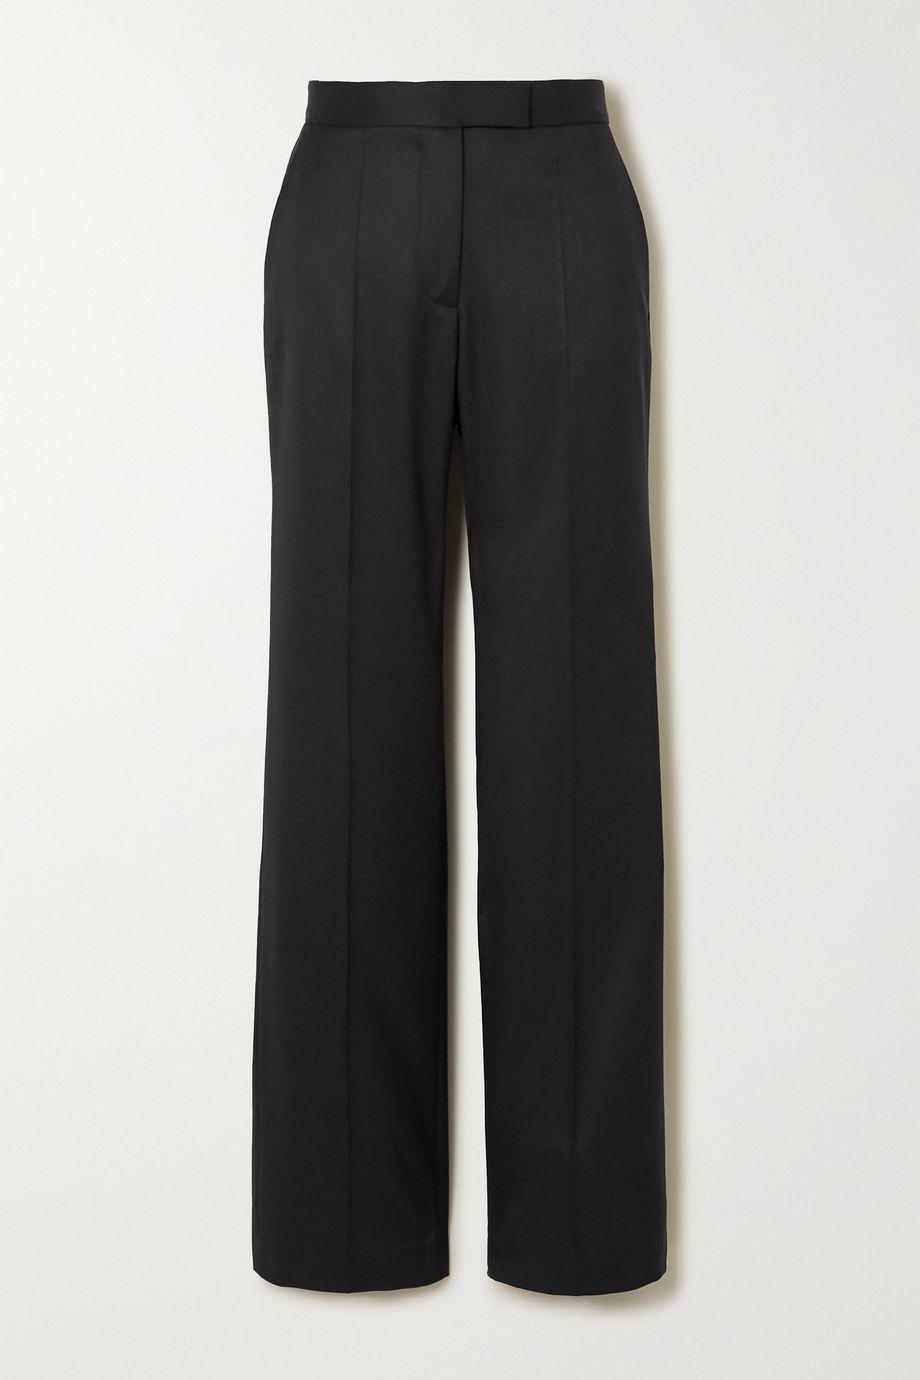 Stella McCartney Grain de poudre wool straight-leg pants